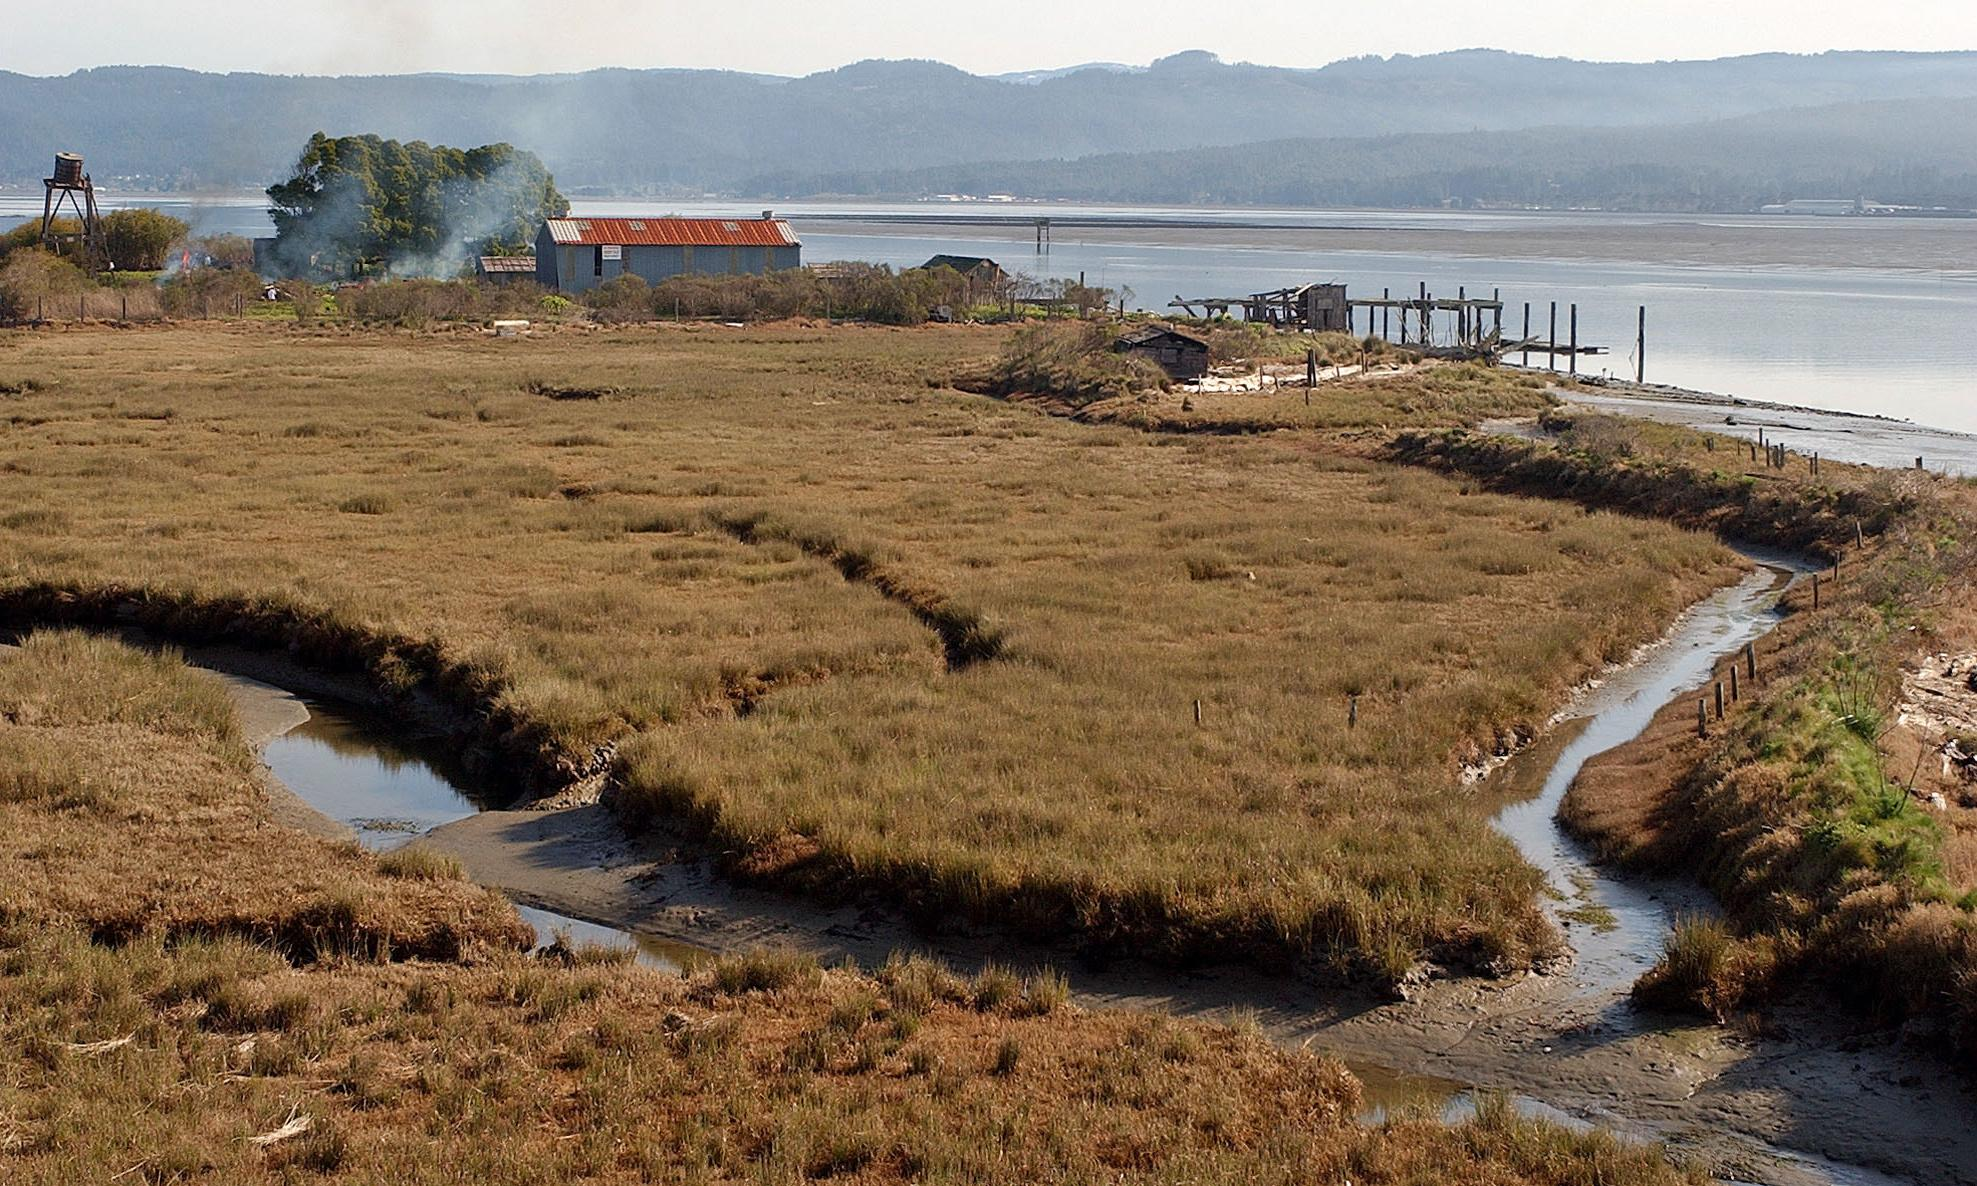 California city returns island taken from native tribe in 1860 massacre